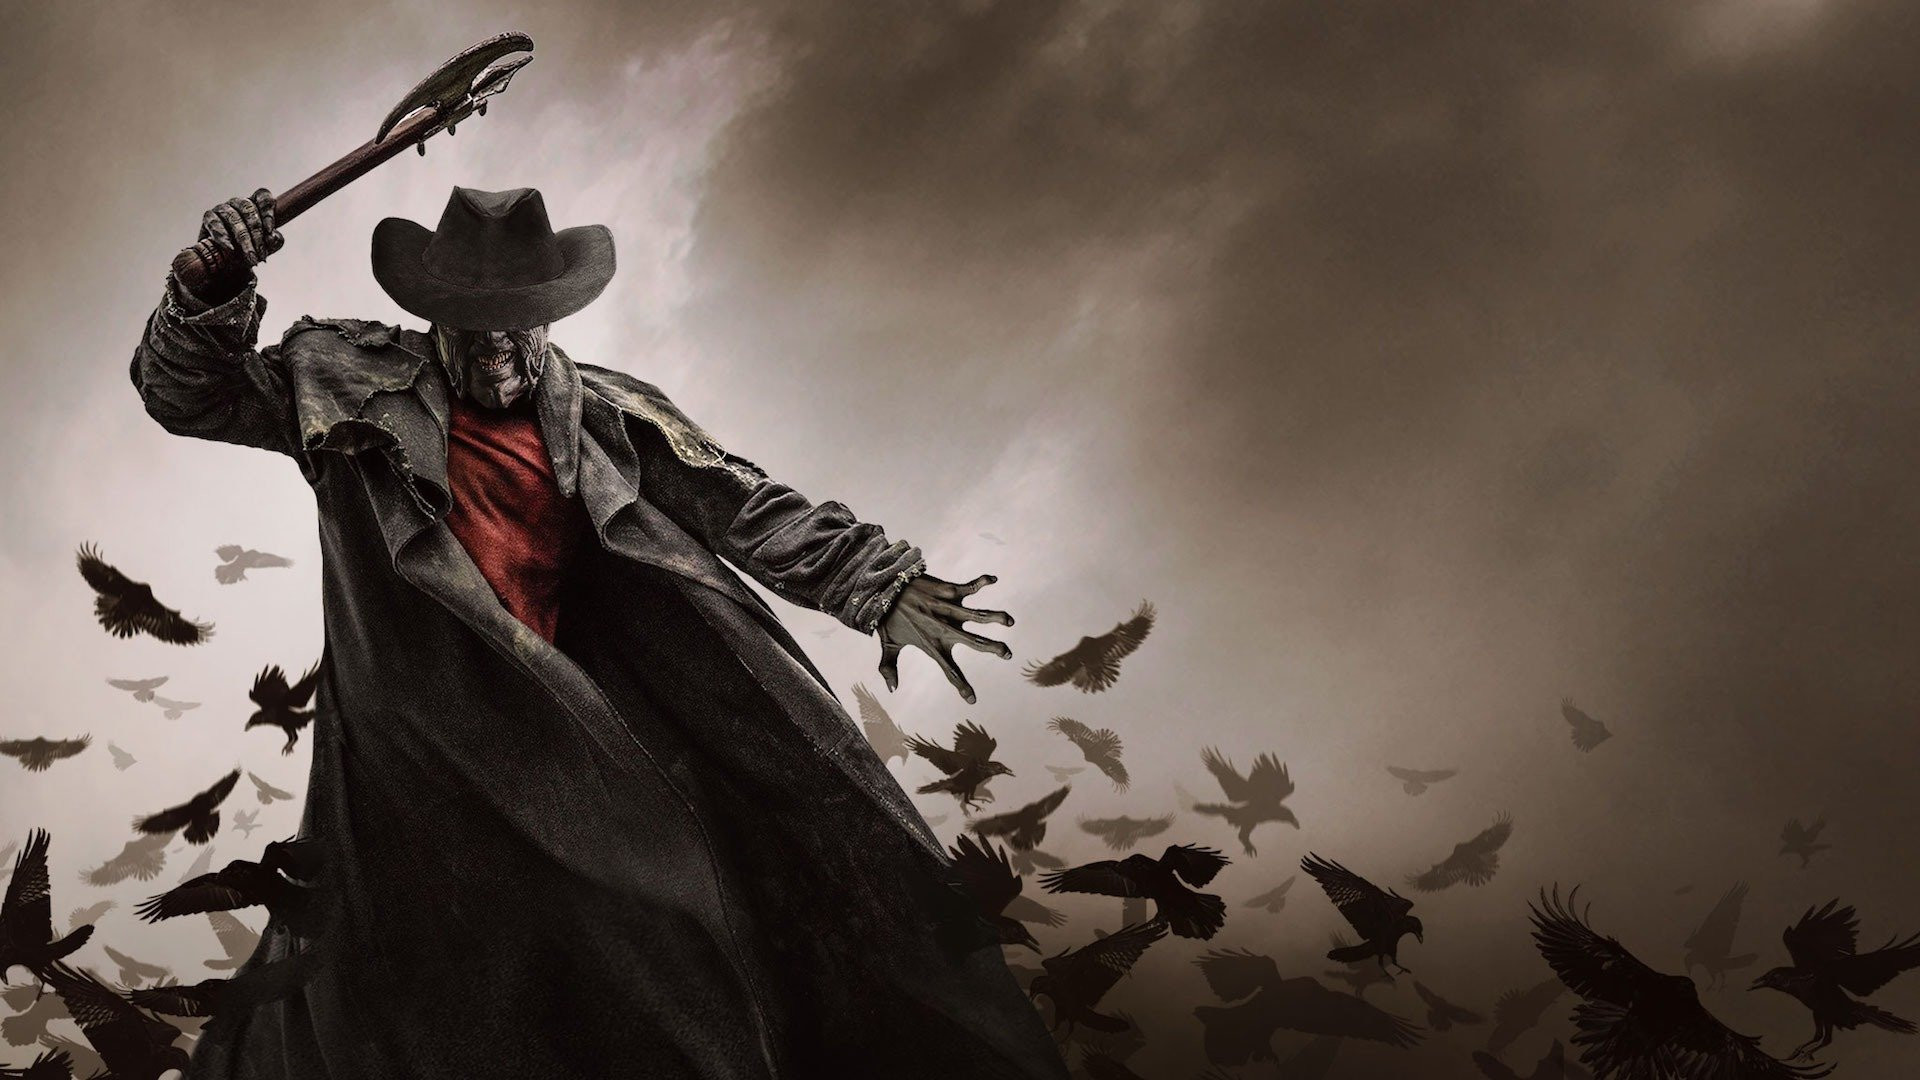 Where'd Ya Get those Eyes?: The Creeper Horror Movie Villain – kwinn pop